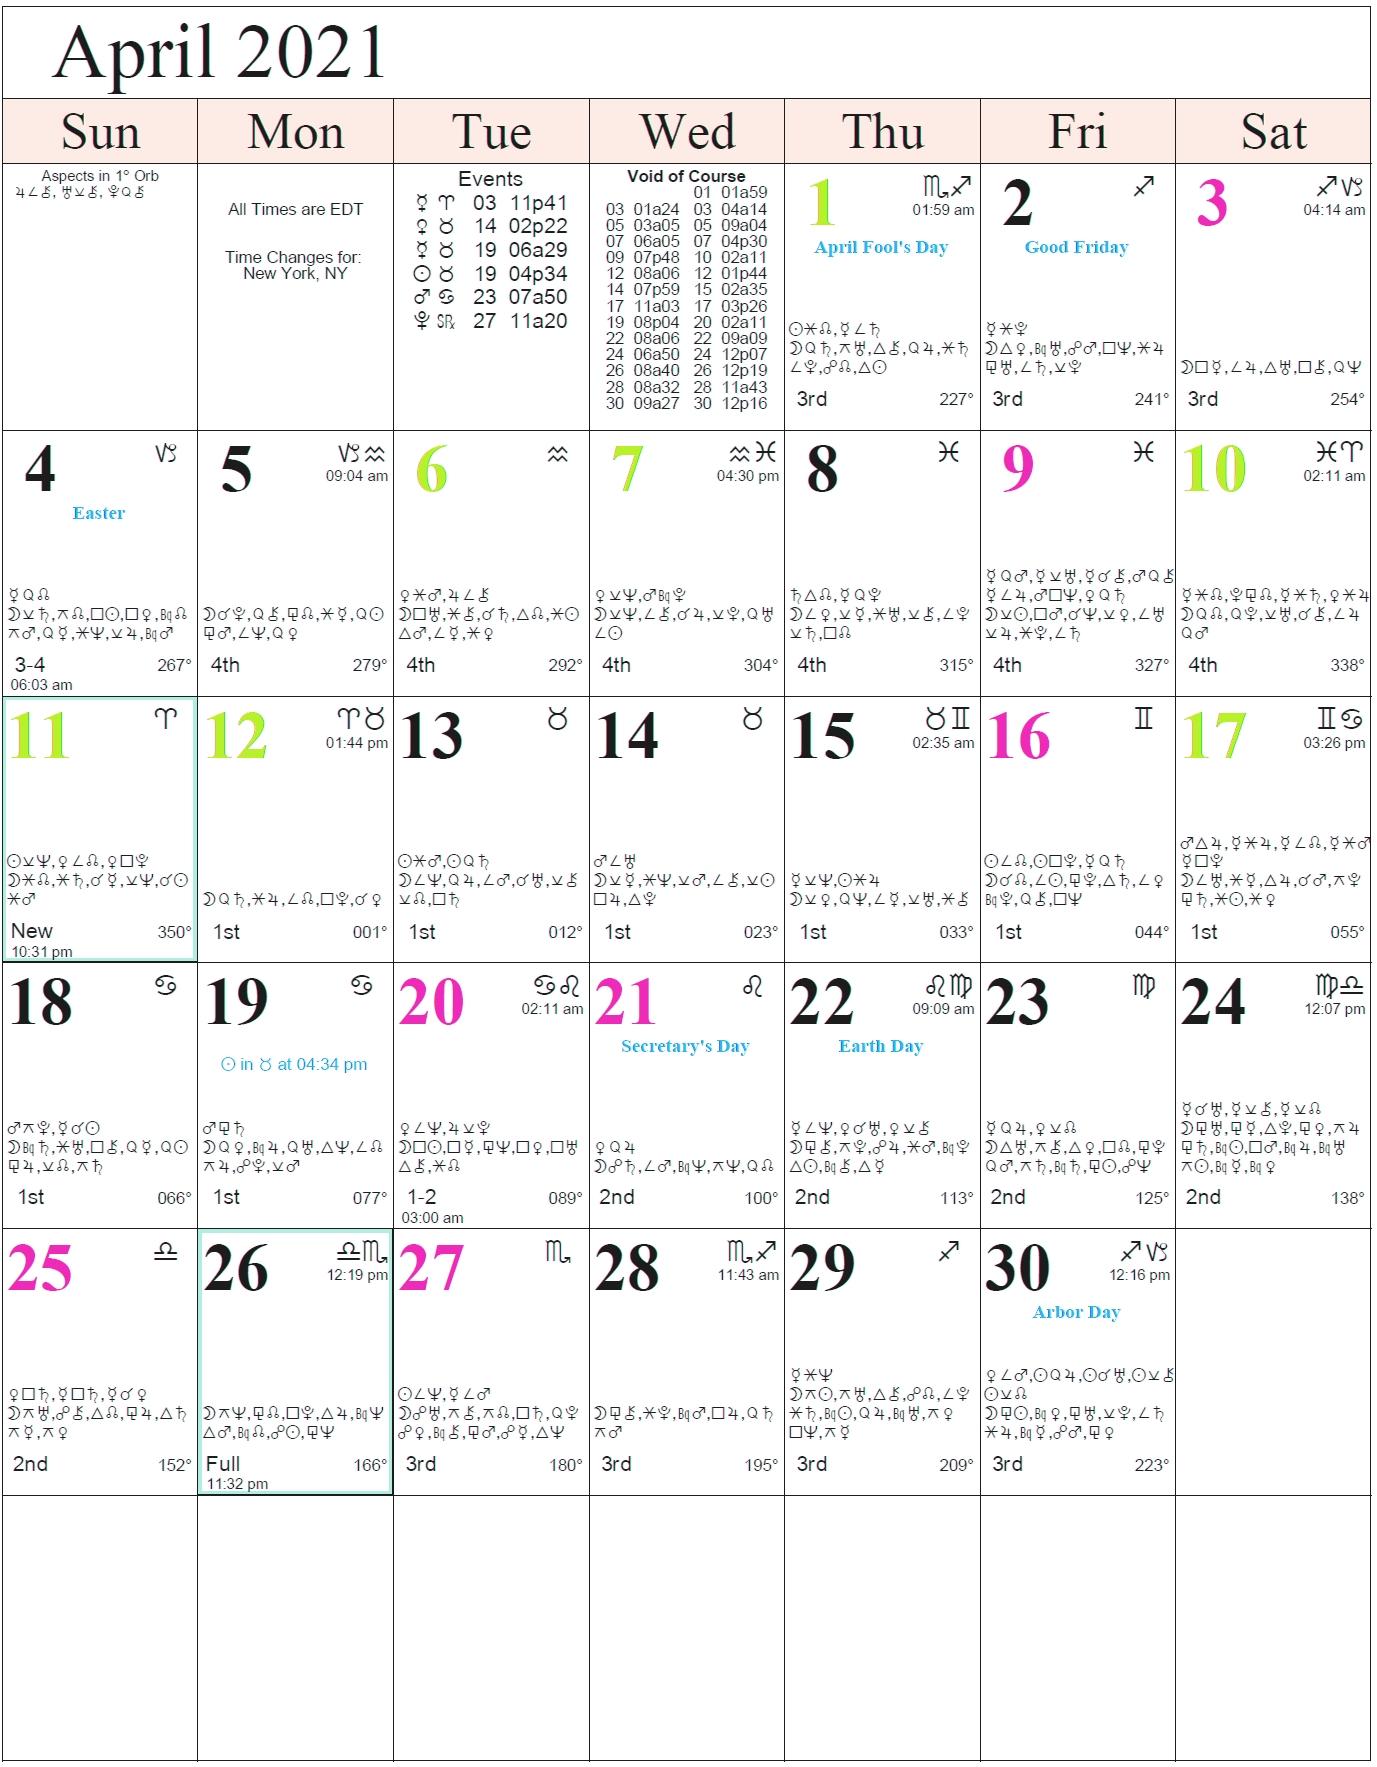 Monthly Astrology Calendars Zodiac Calendar With Dates